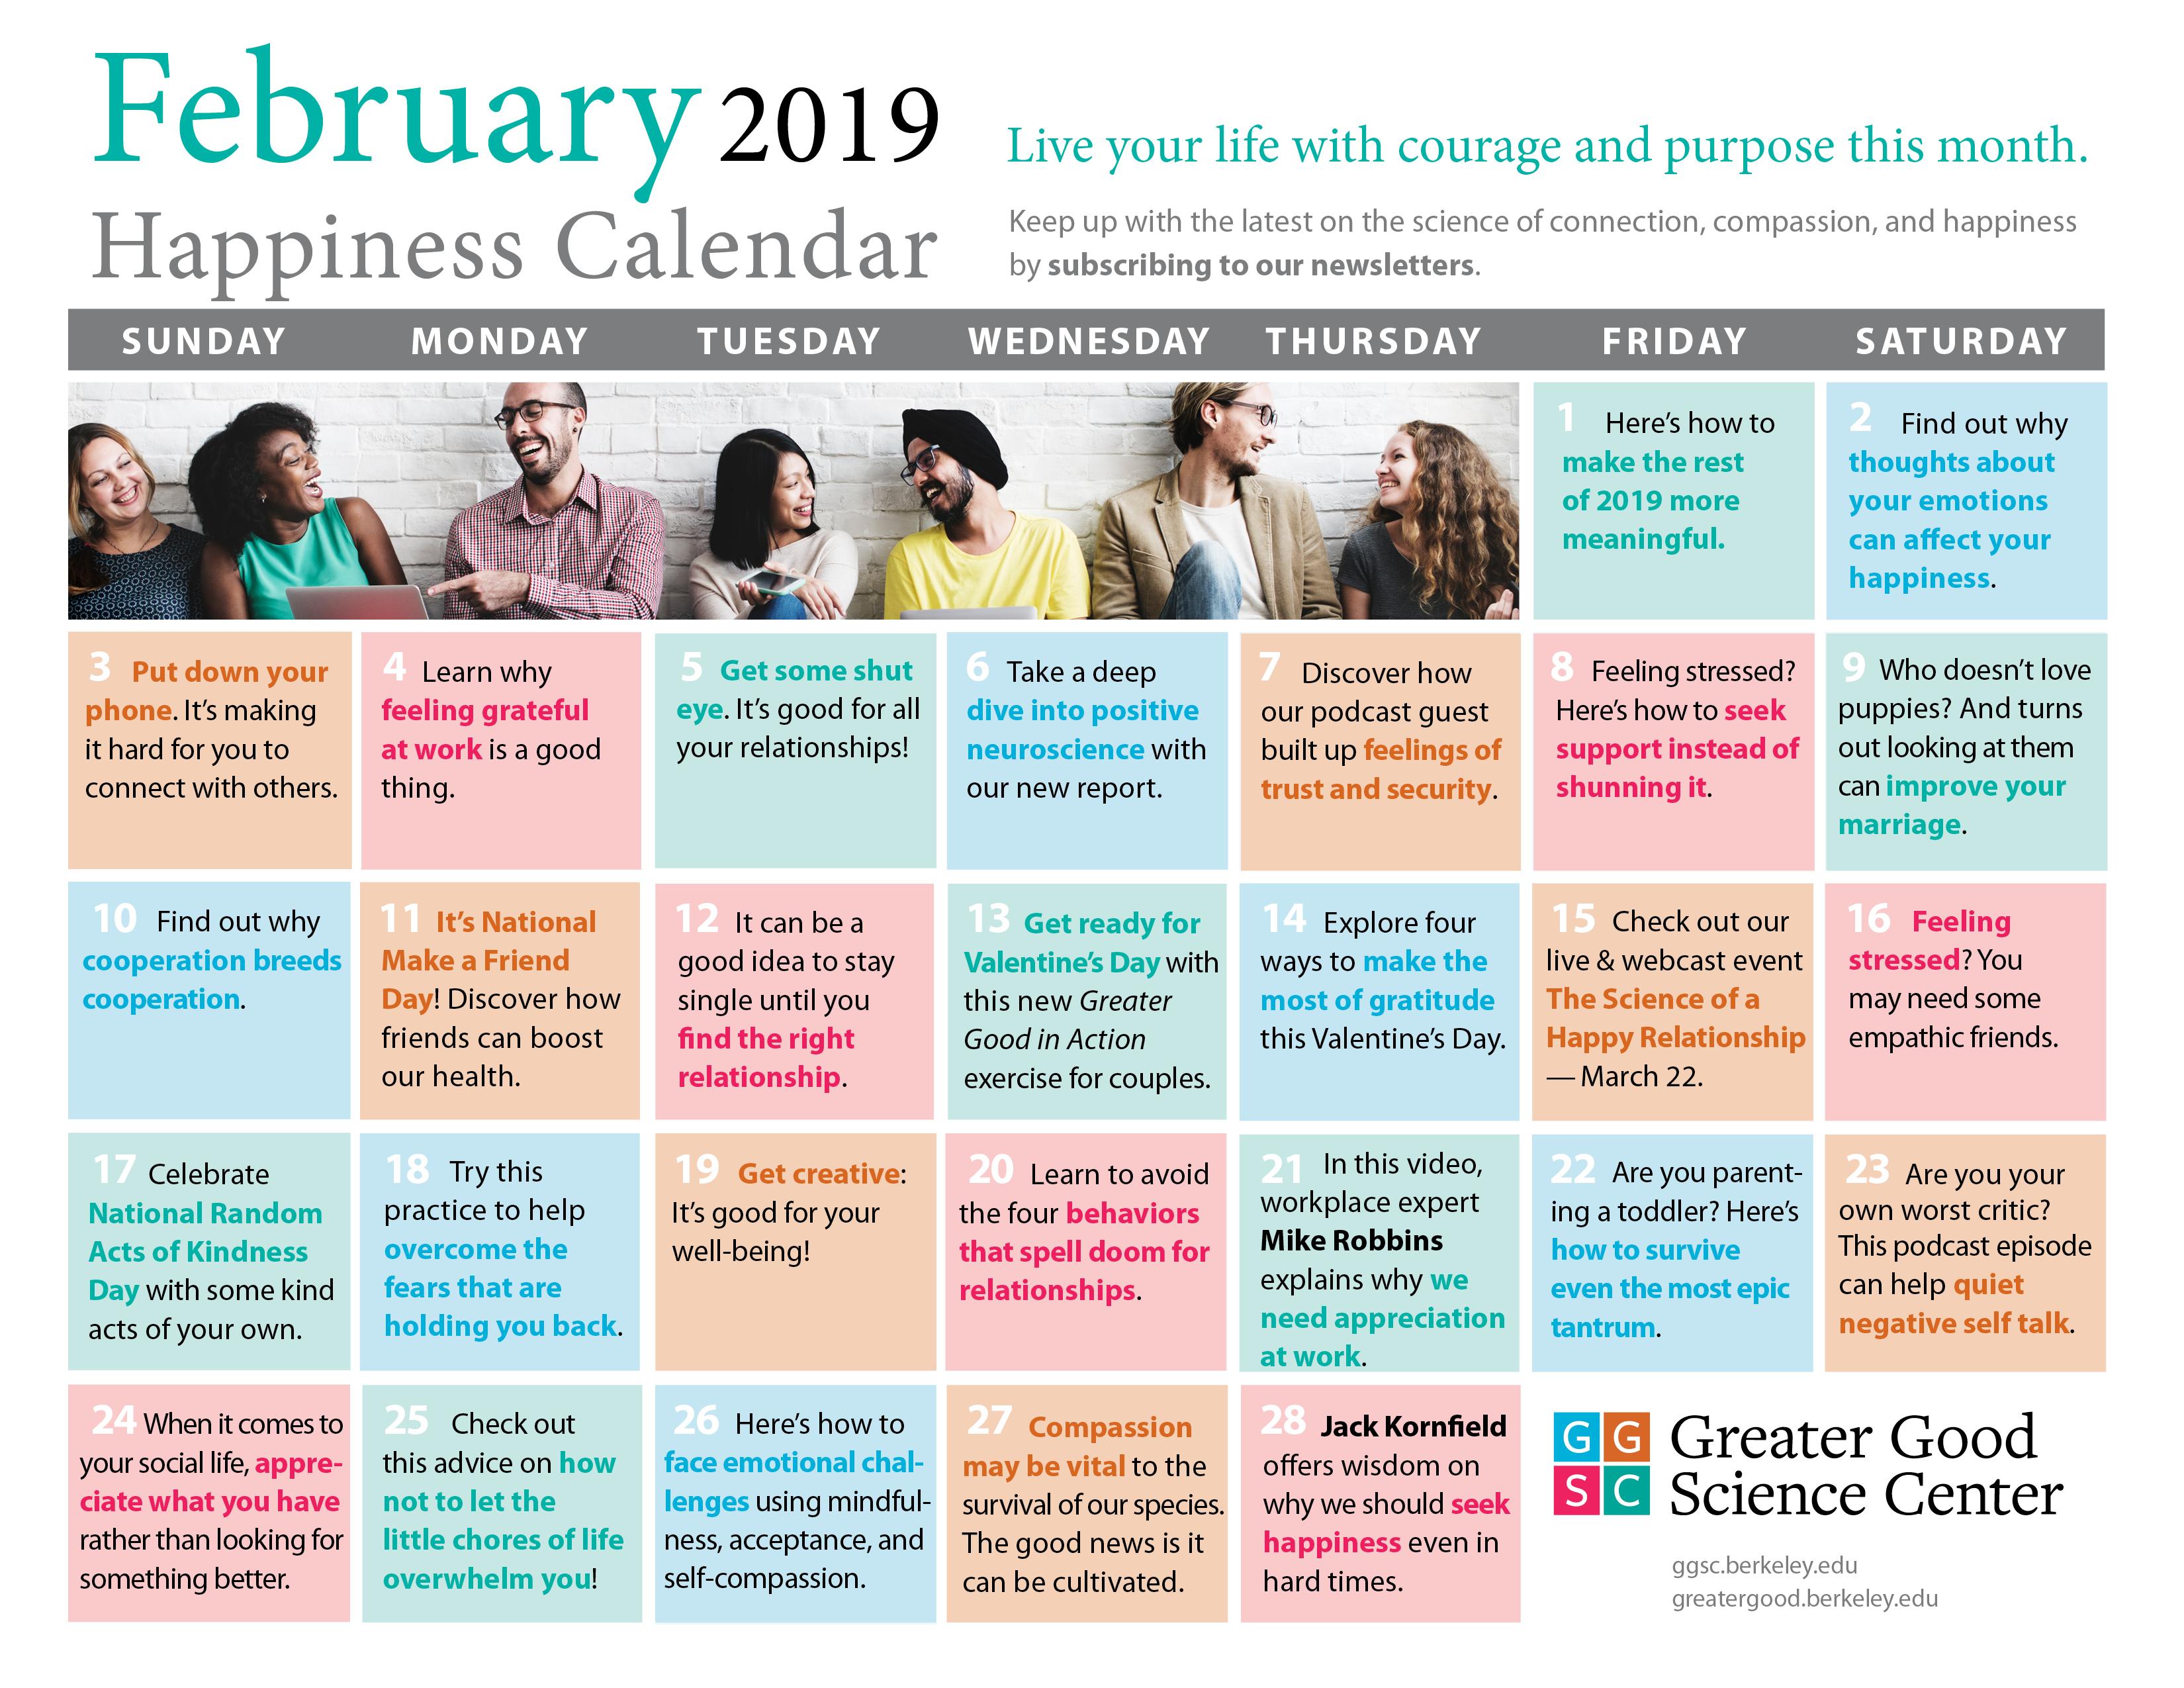 February Happiness Calendar